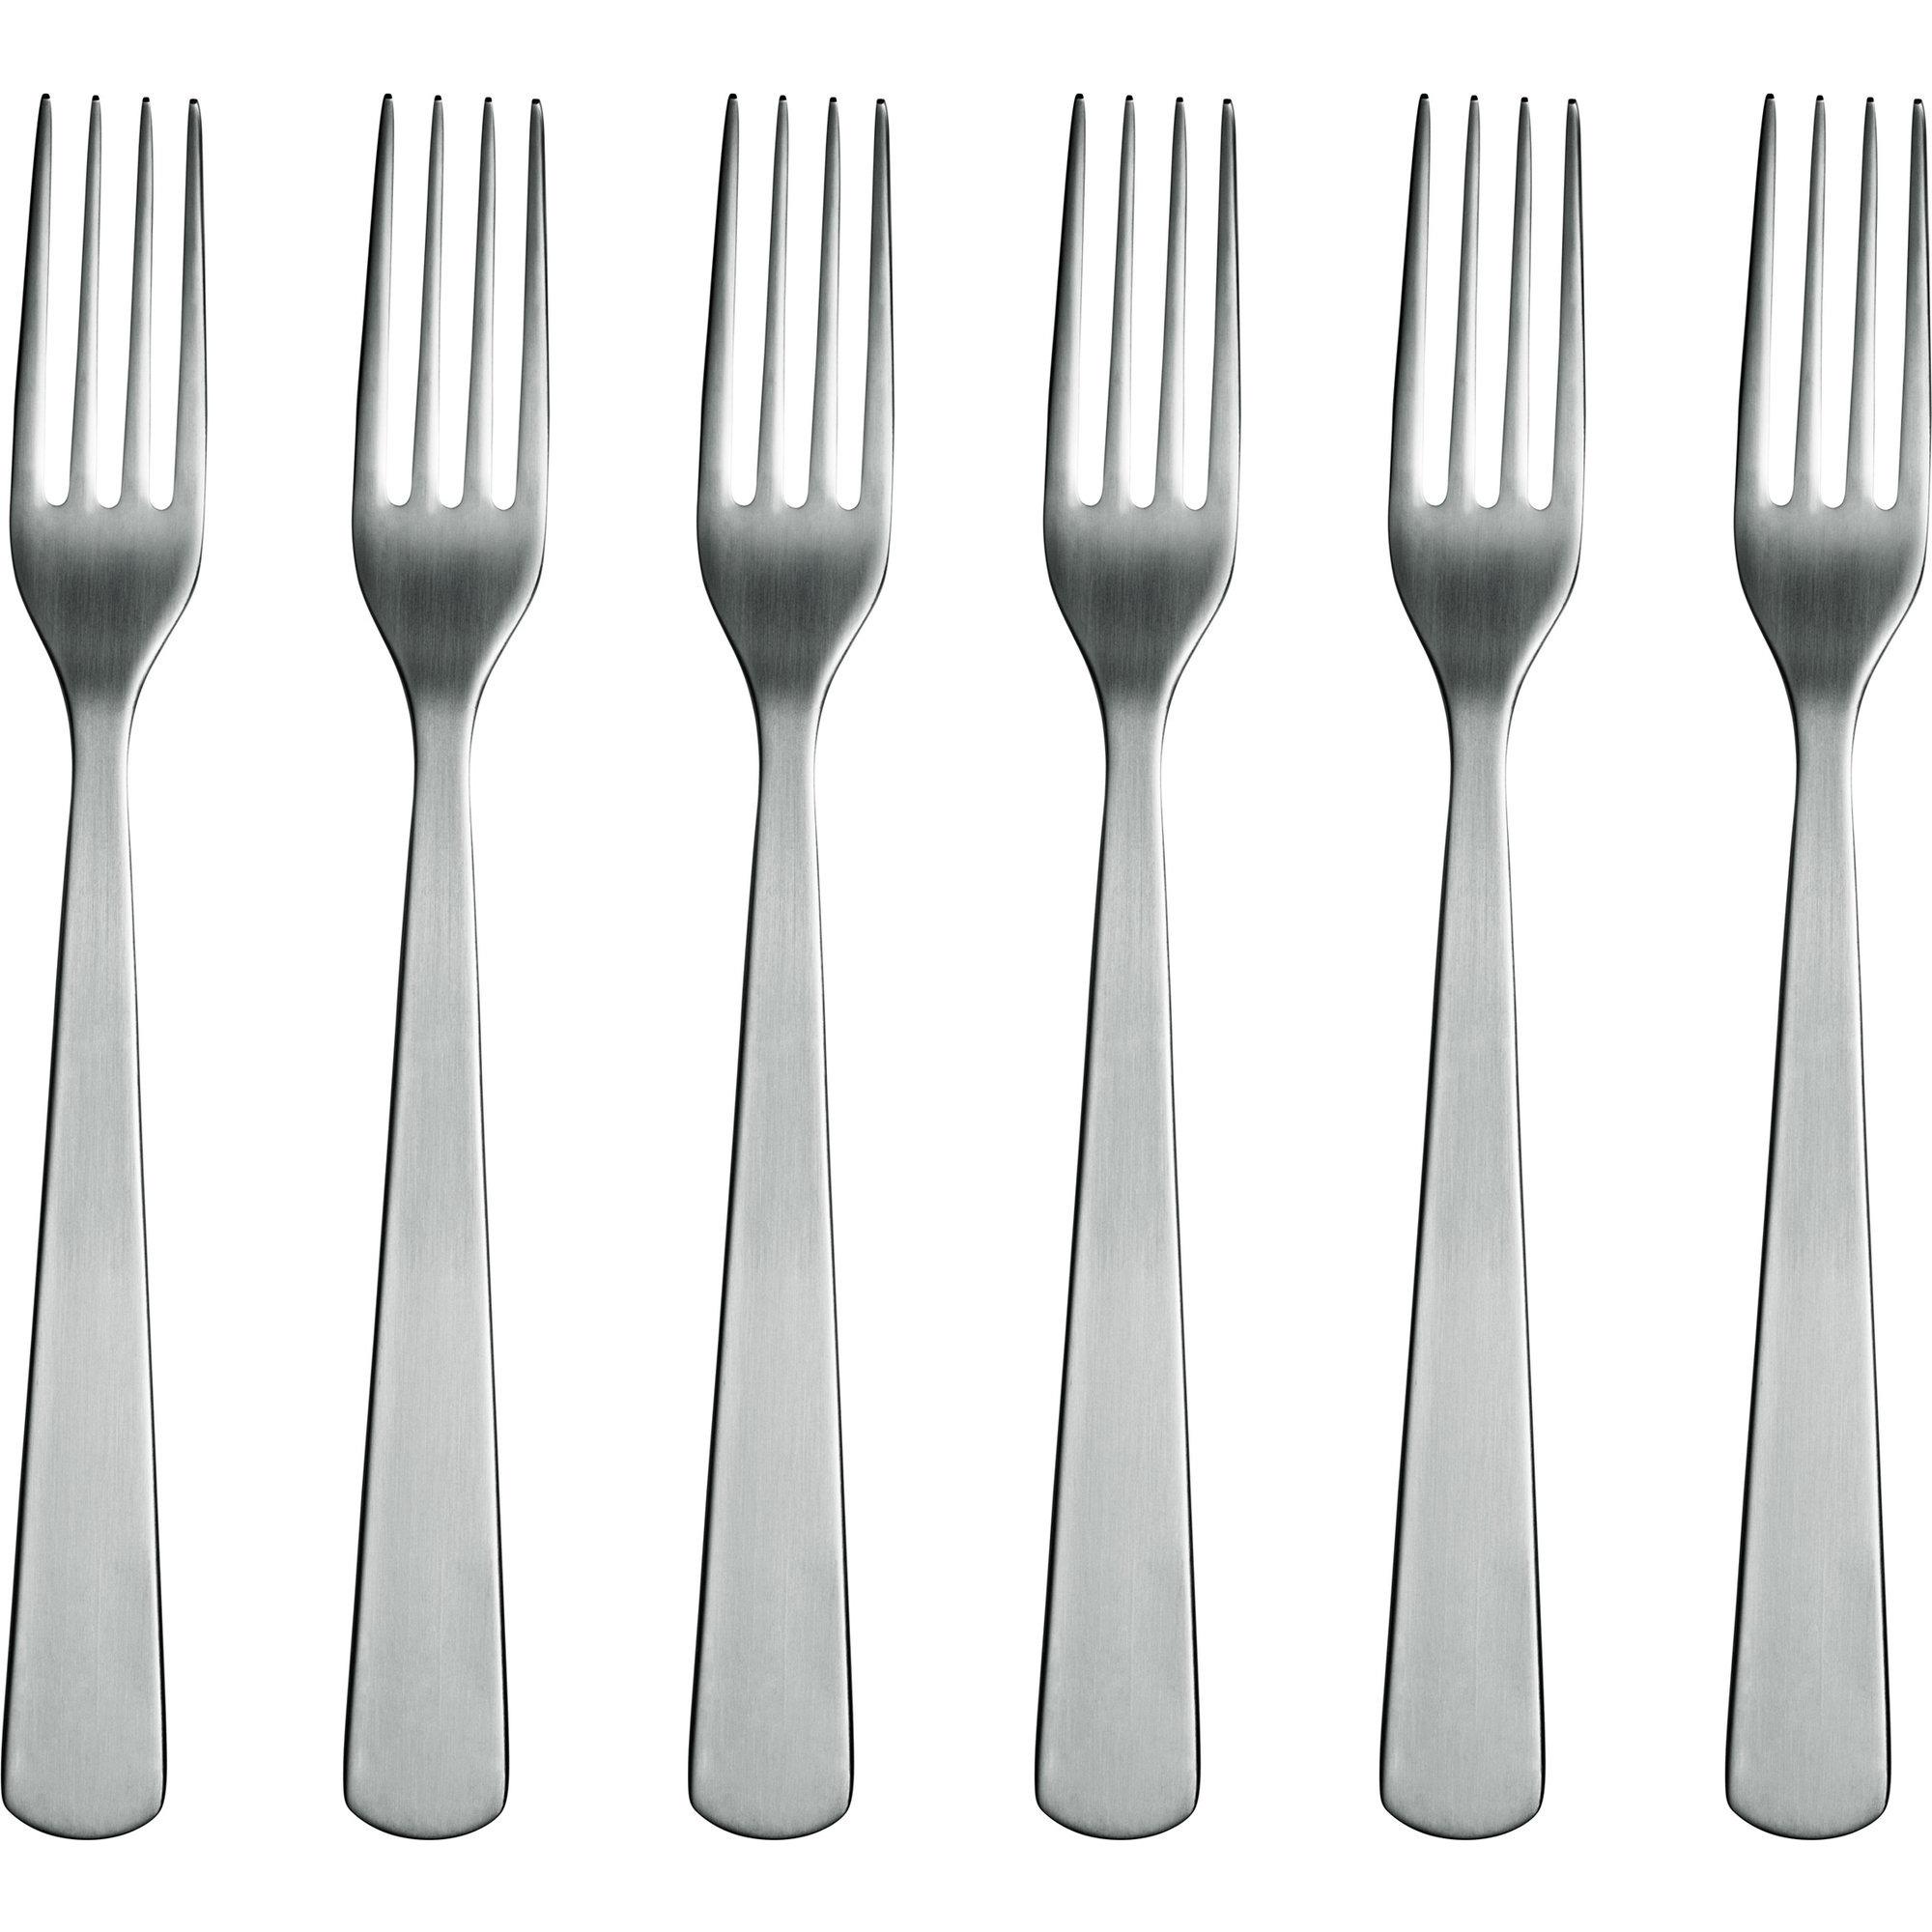 Normann Copenhagen Normann Forks – 6 pack Steel